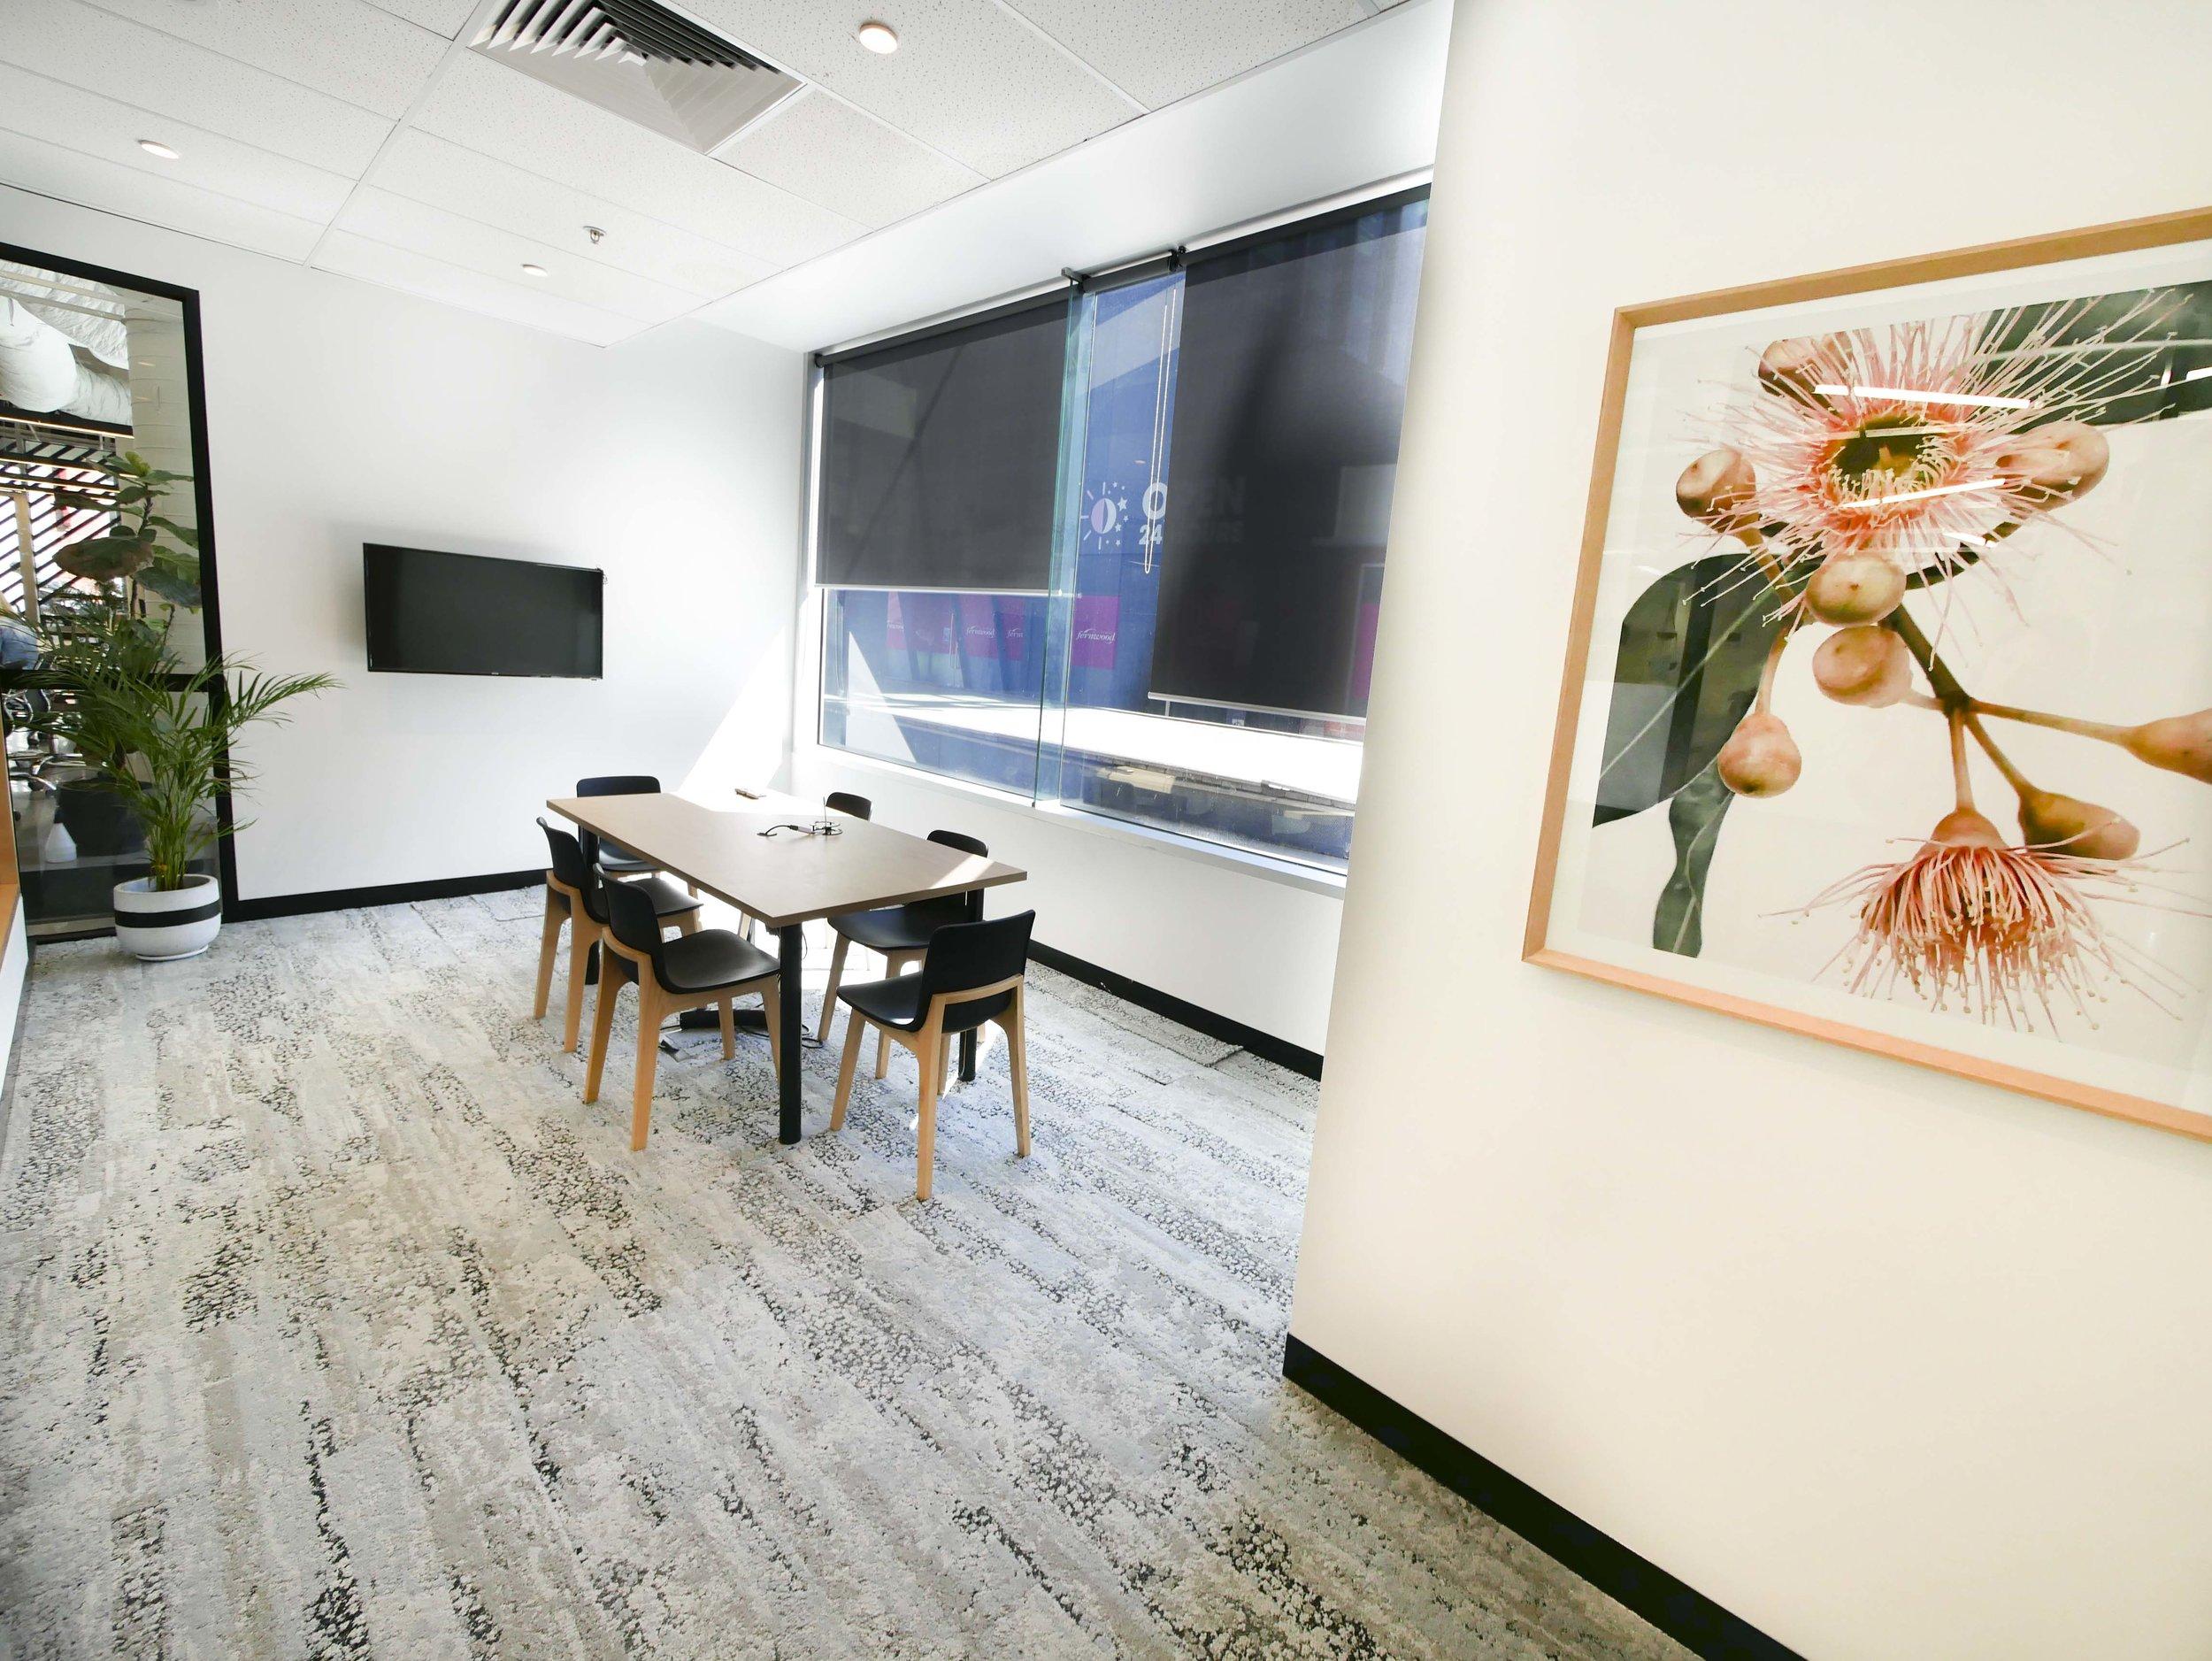 upload-project-iw-meetingroom.jpg